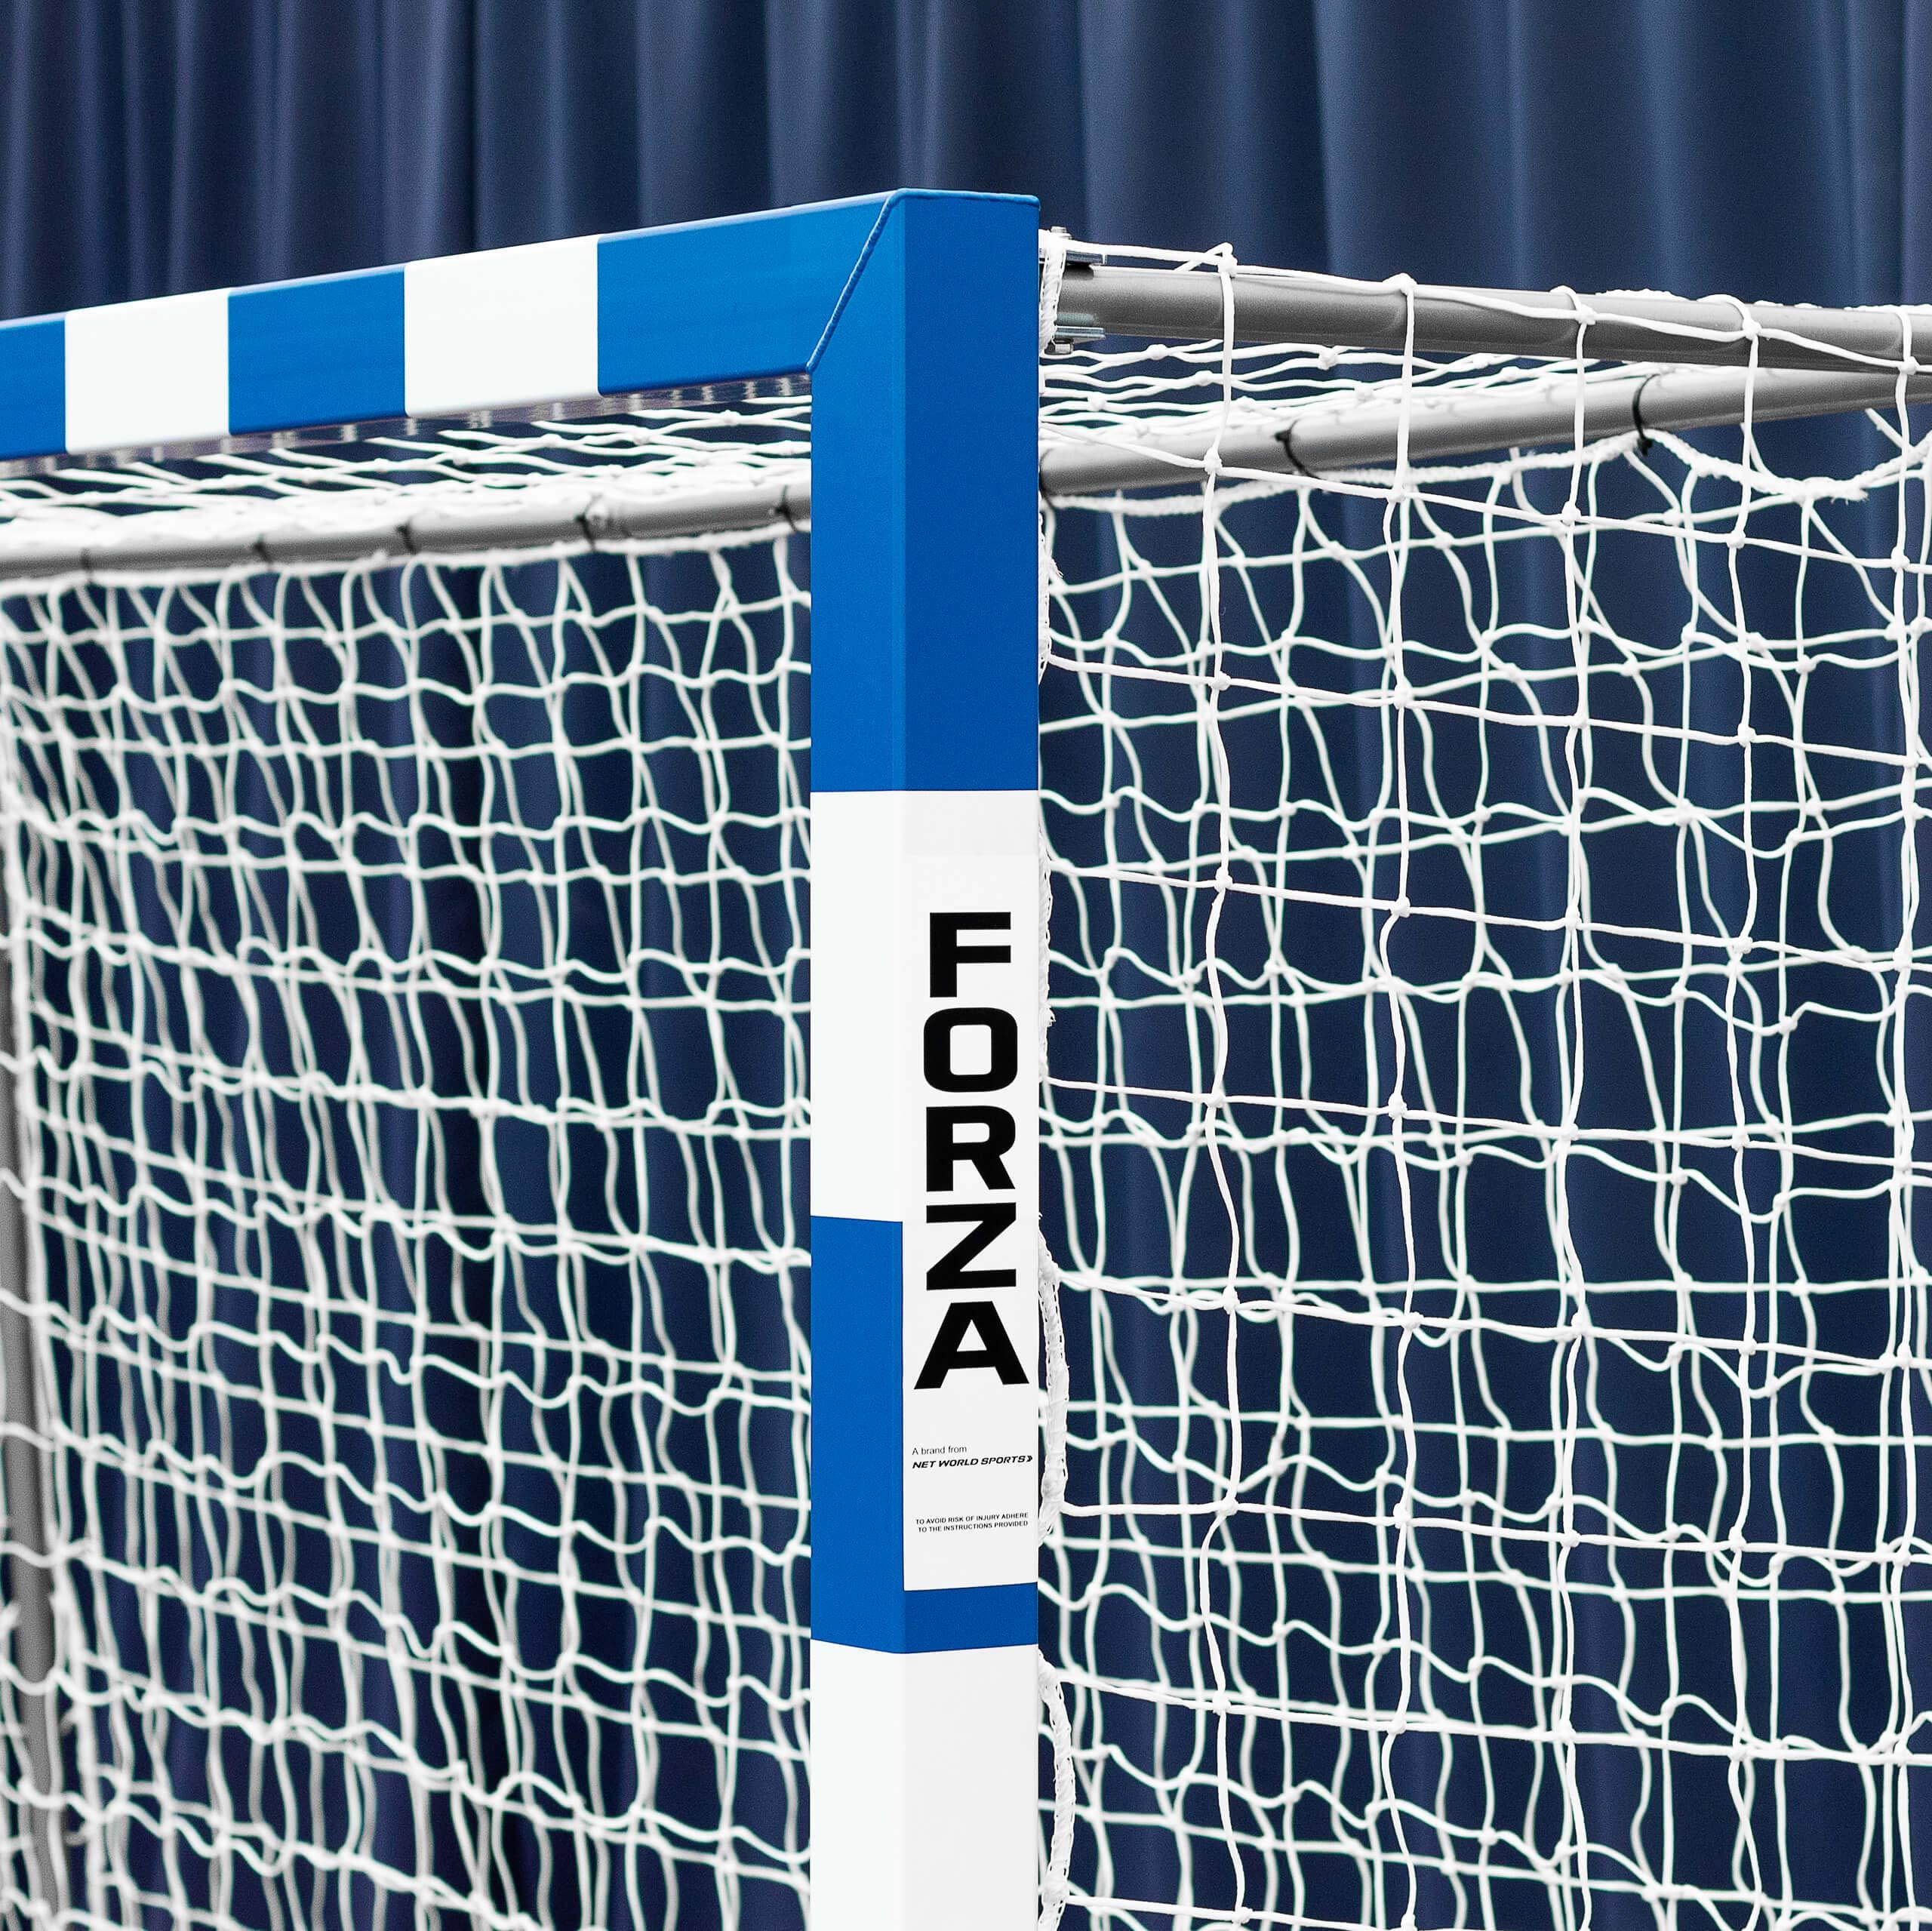 Forza Alu80 Competition Handball Goals   IHF Regulation Size 3m x 2m Handball Goal [Net World Sports] (Pair, Blue) by Forza (Image #4)